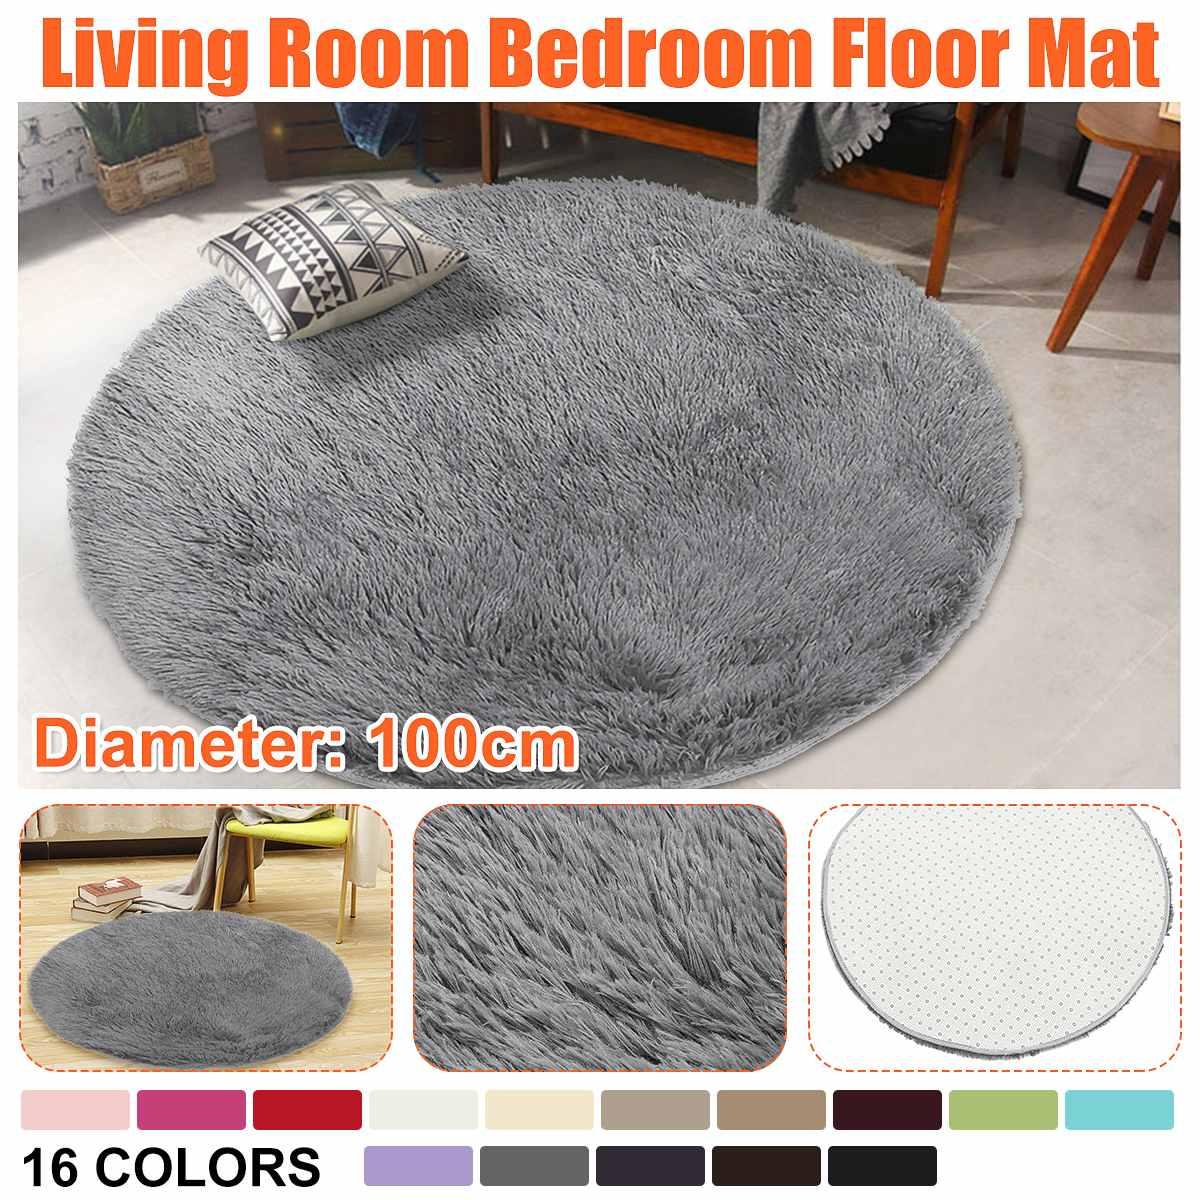 Diameter 100cm Round Floor Mat Cover Anti-skid Shaggy Area Yoga Rug Home Living Room Bedroom Carpet Blanket Mat